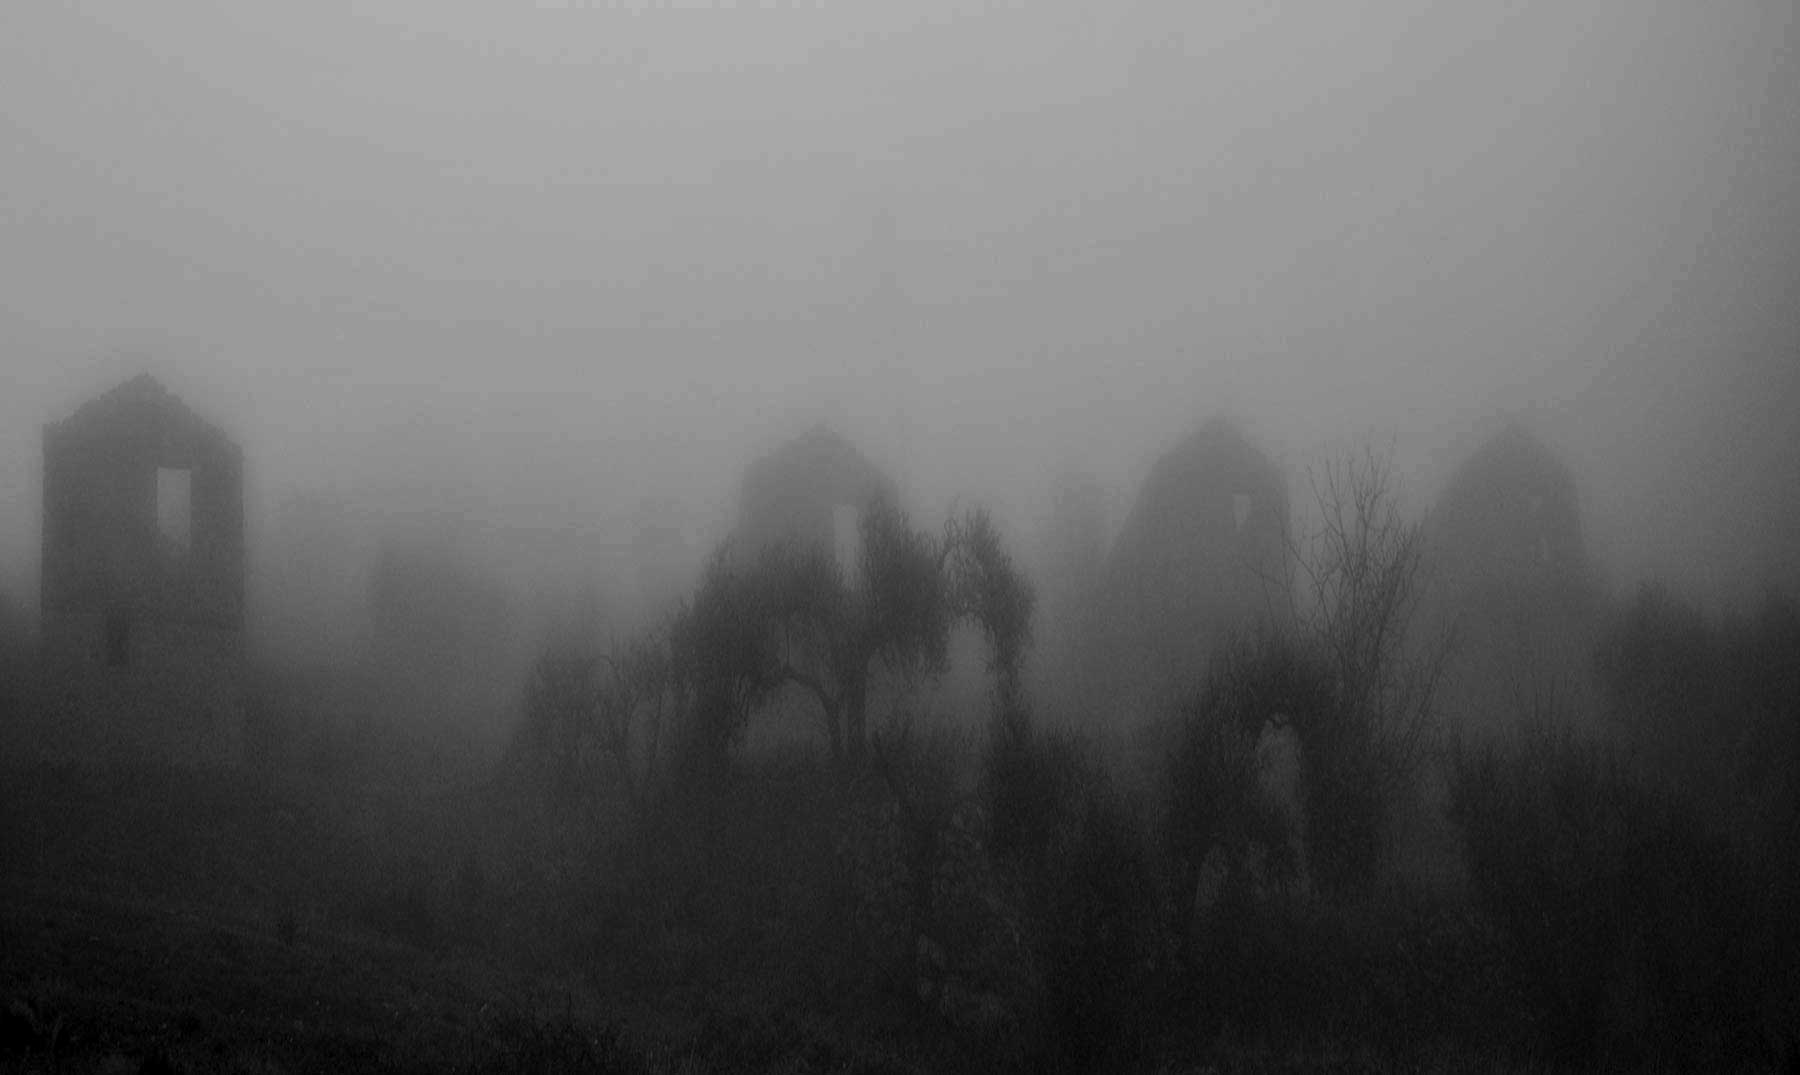 Los fantasmas de la primera batalla de la guerra civil inglesa